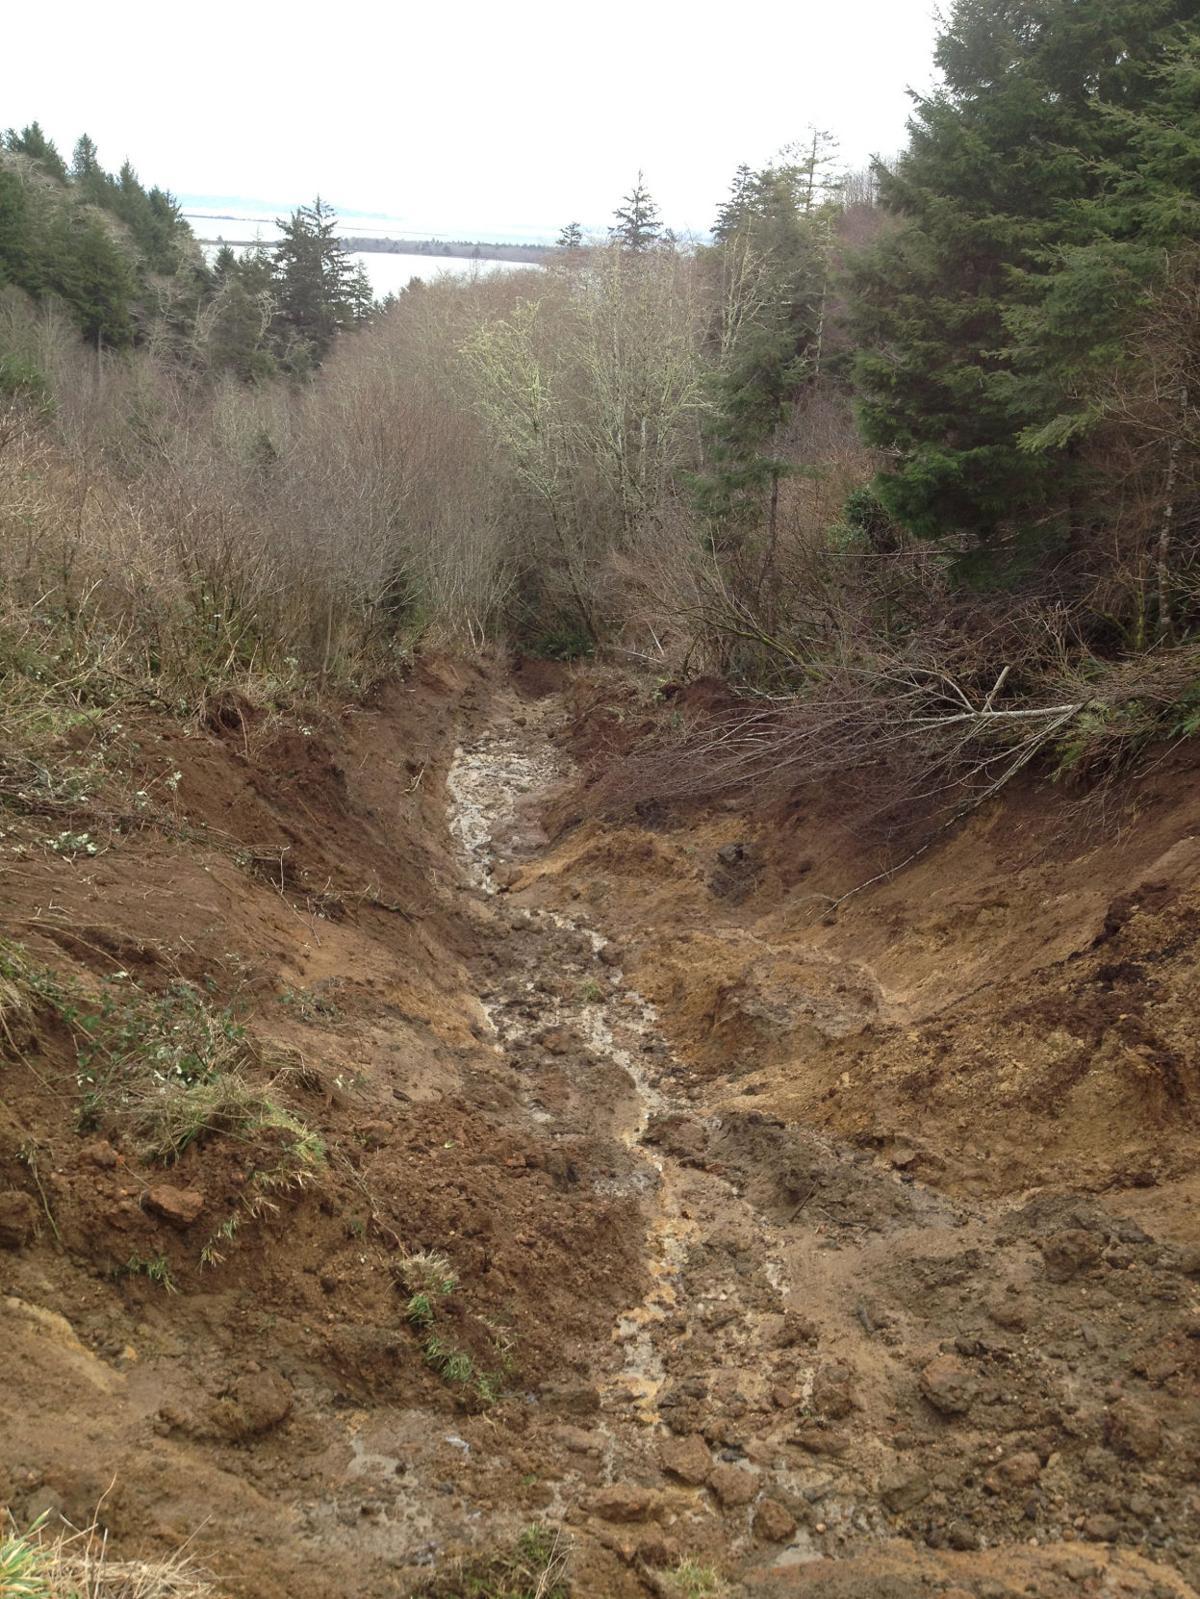 Landslide impacts hillside above Baker Bay in Ilwaco